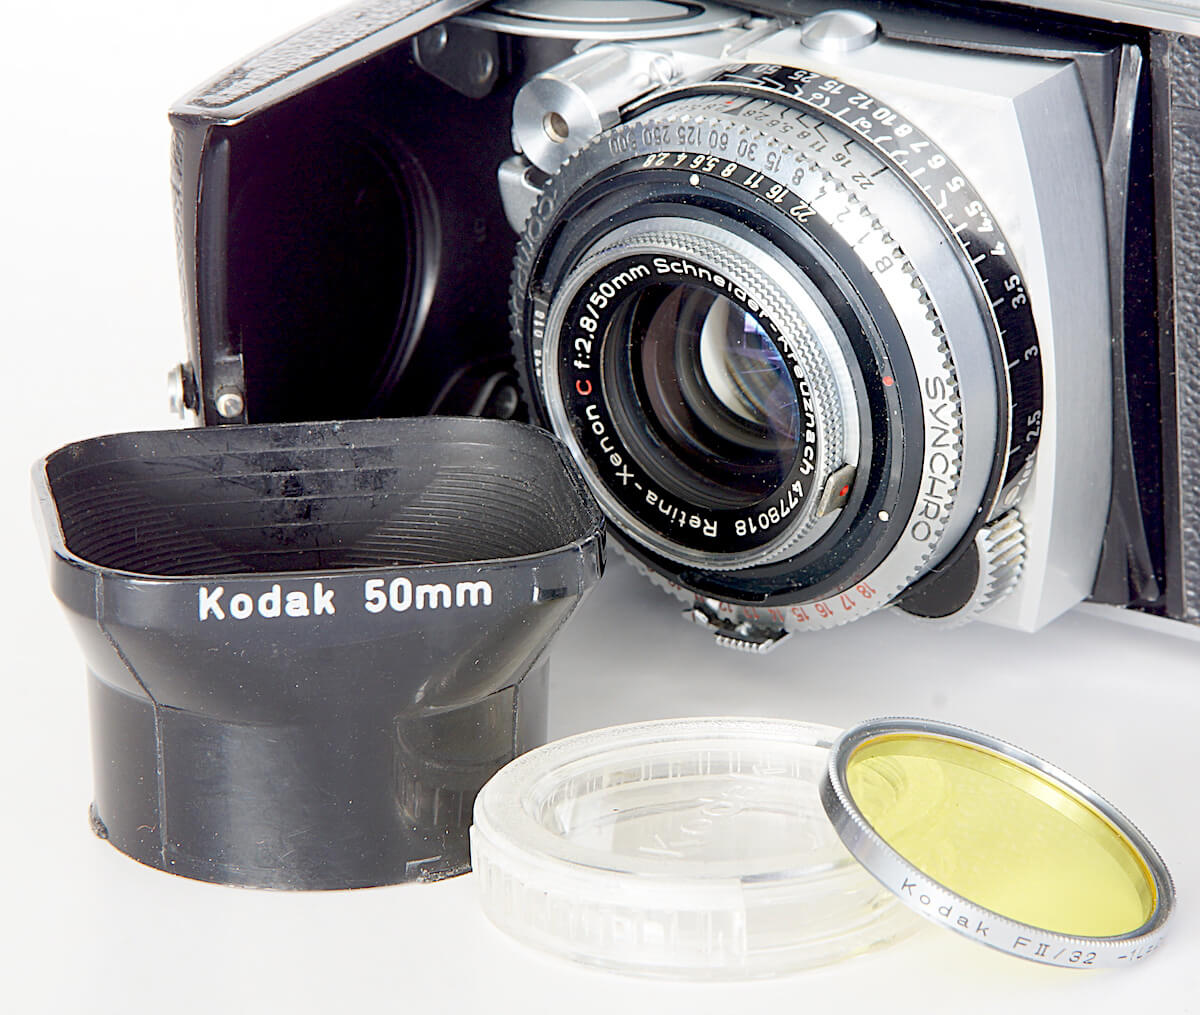 Kodak Retina with lens attachments